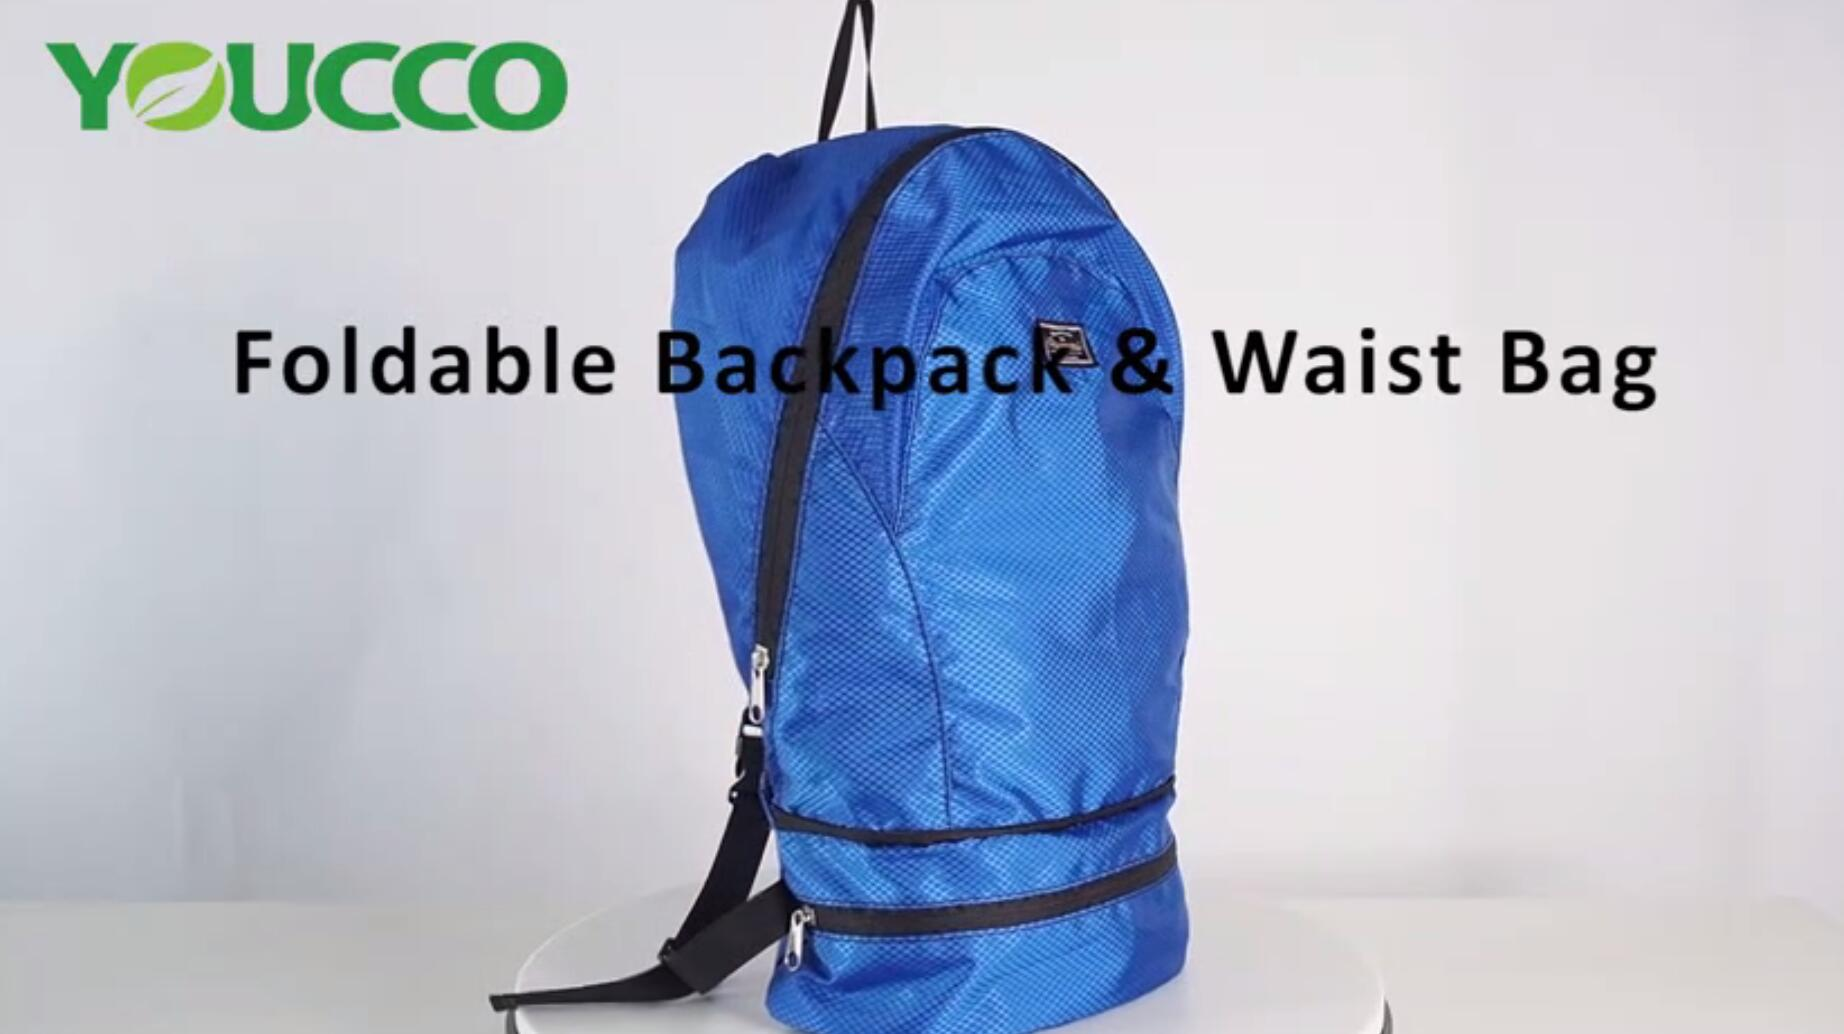 Foldable Backpack & WaistBag